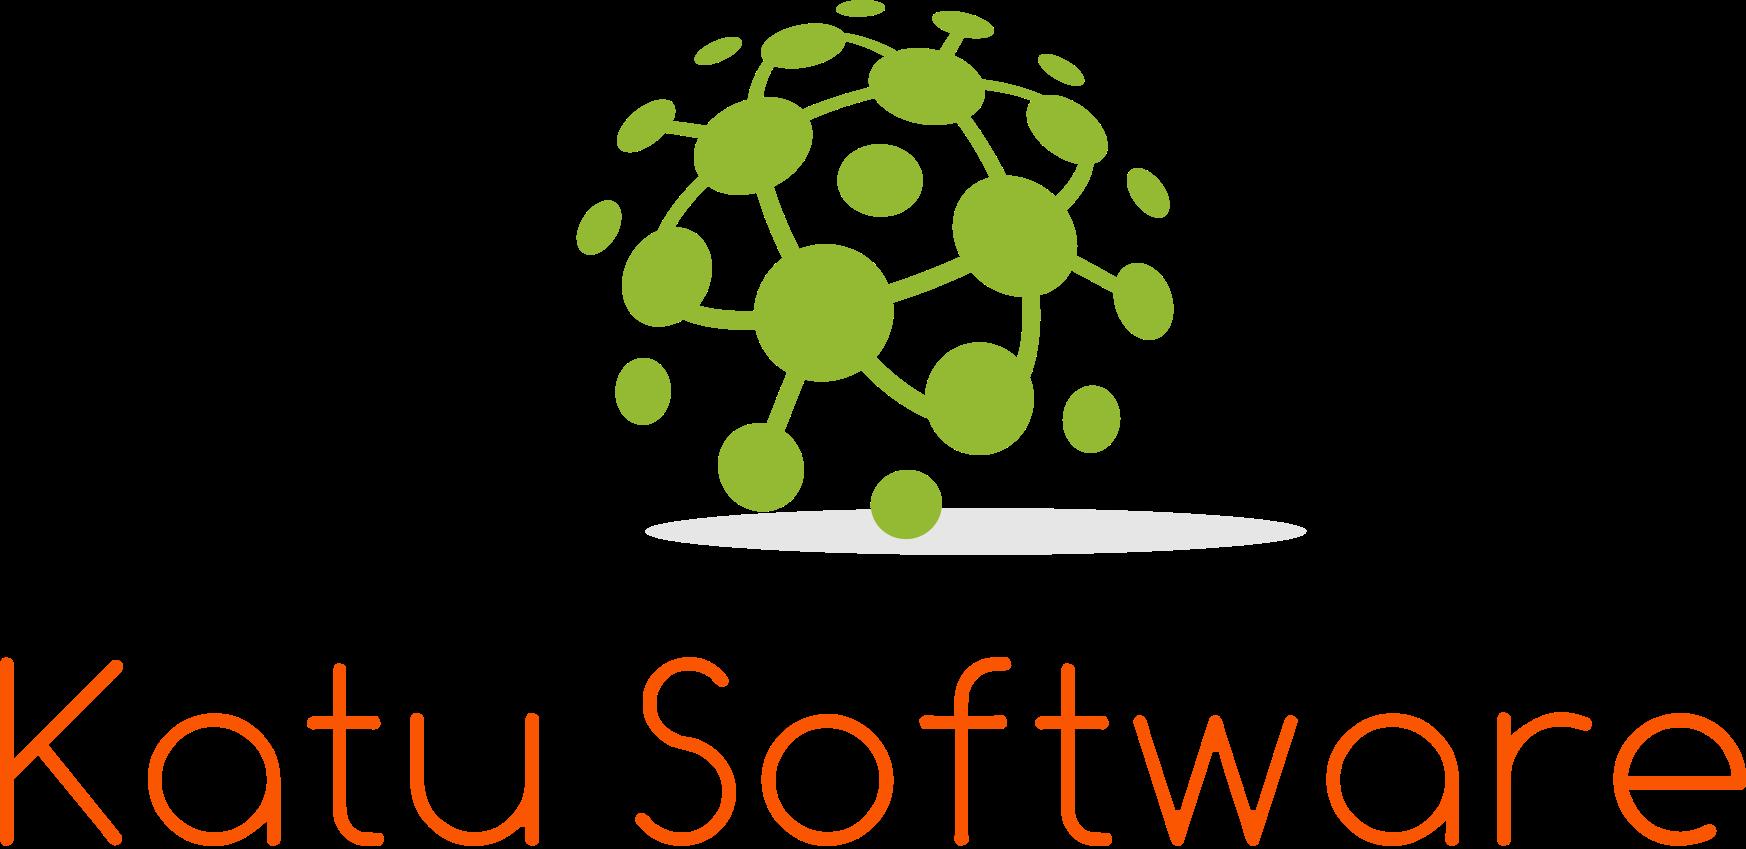 Katu Software Limitada, a chatbot developer